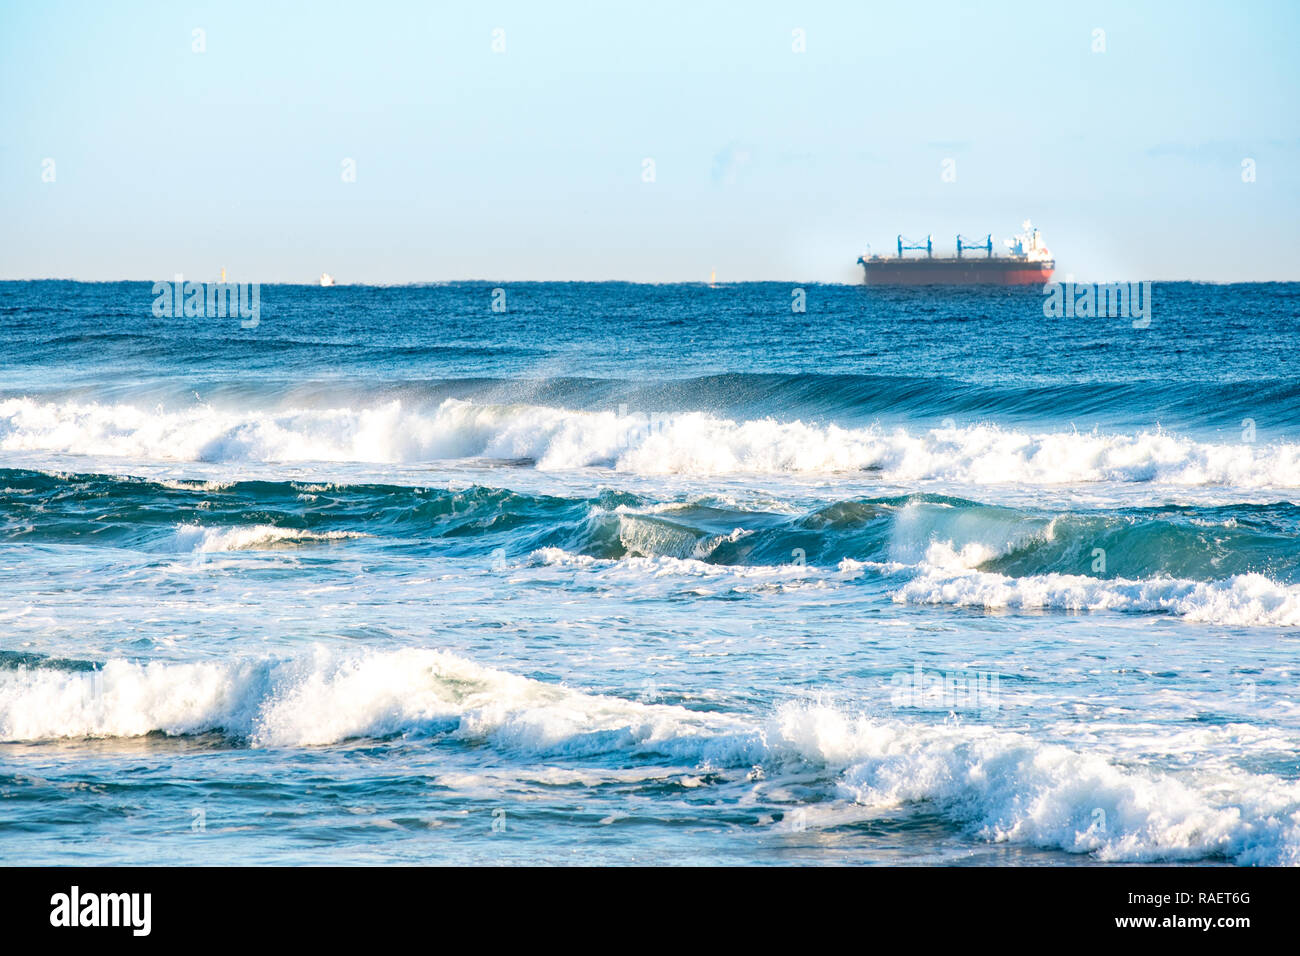 Wilde Wellen und blauer Himmel. Gangwon-do Strand, Republik Korea. Stockfoto